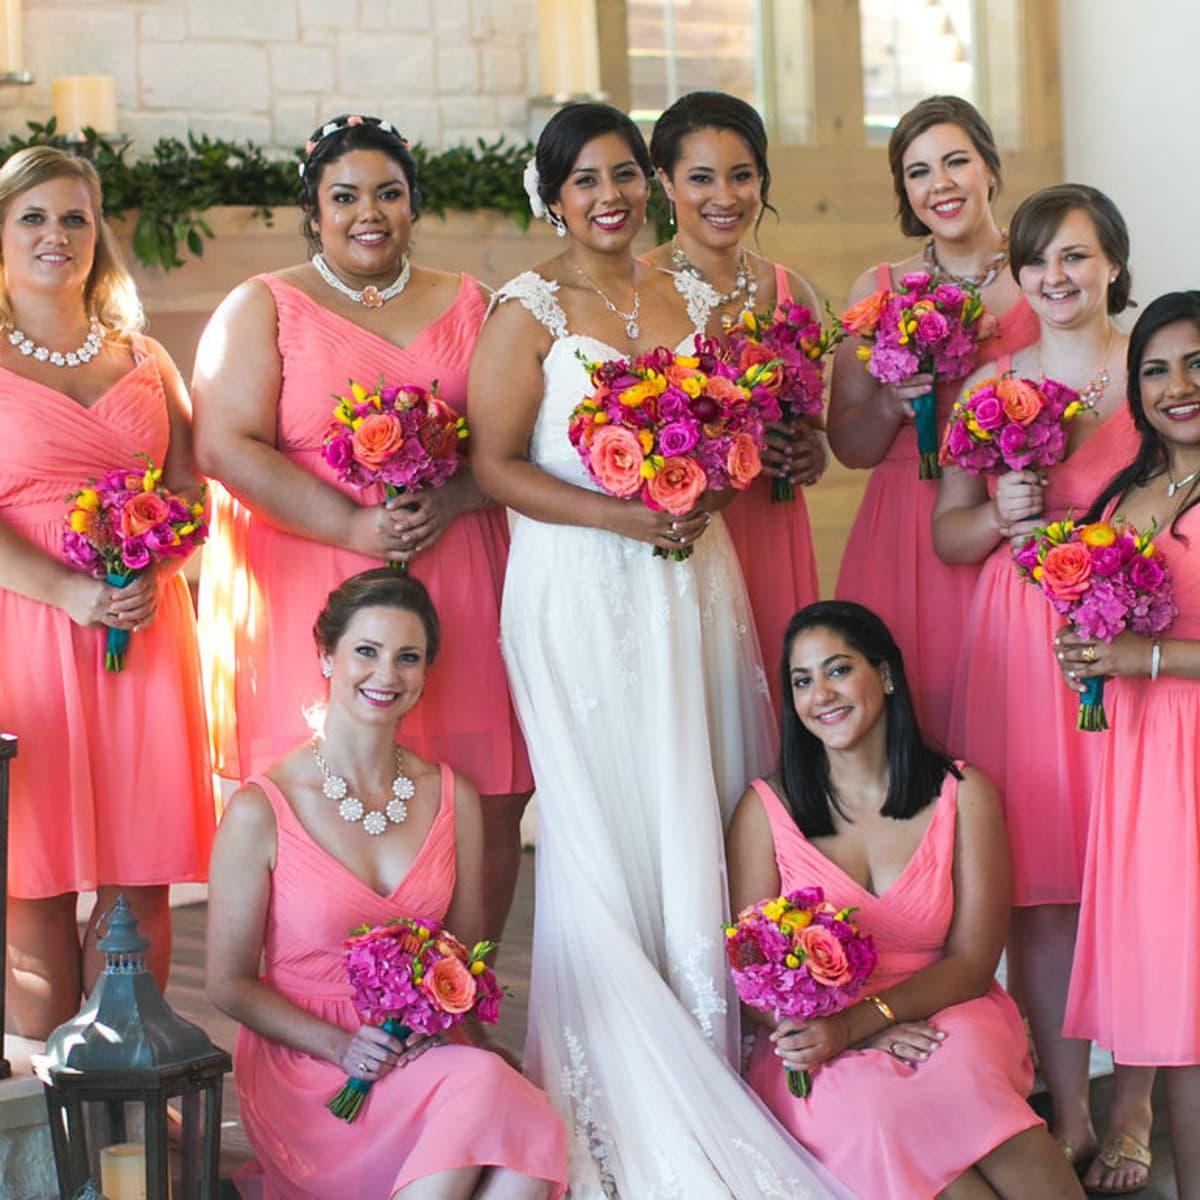 Siddiqui wedding, bridesmaids, Real Weddings 2017